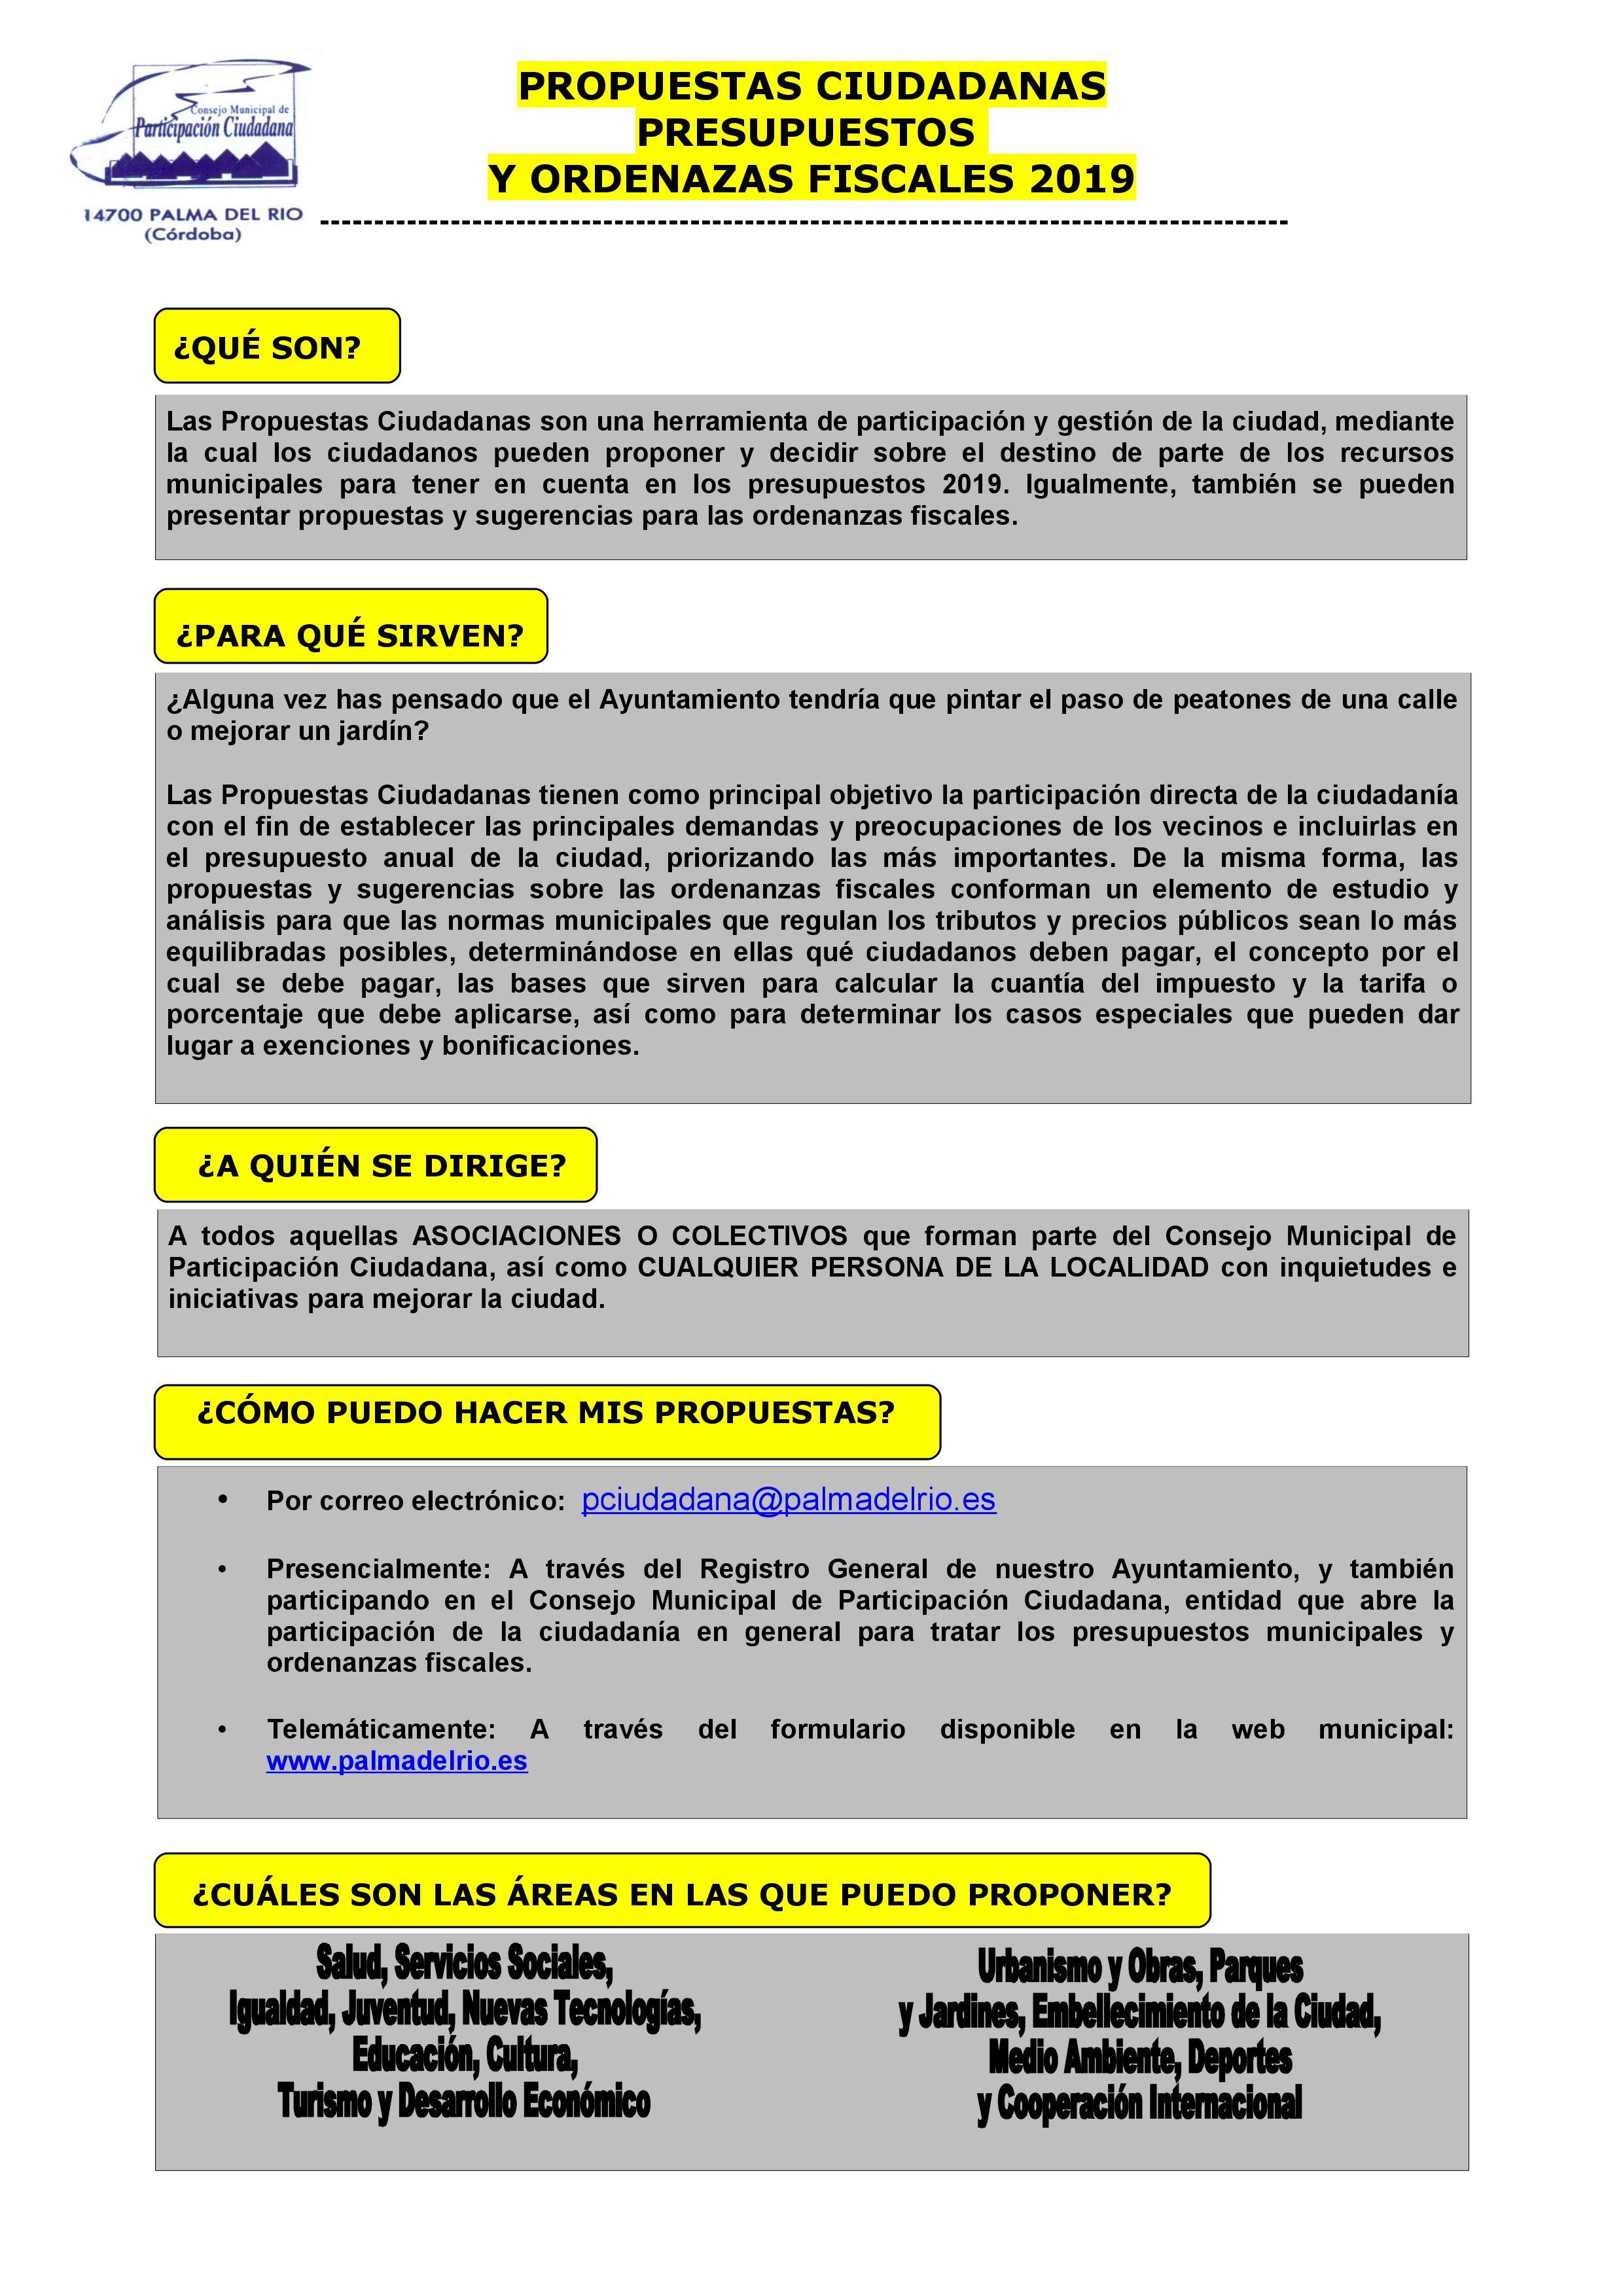 https://www.palmadelrio.es/sites/default/files/herramienta.propuestas.ciudadanas.2019.jpg